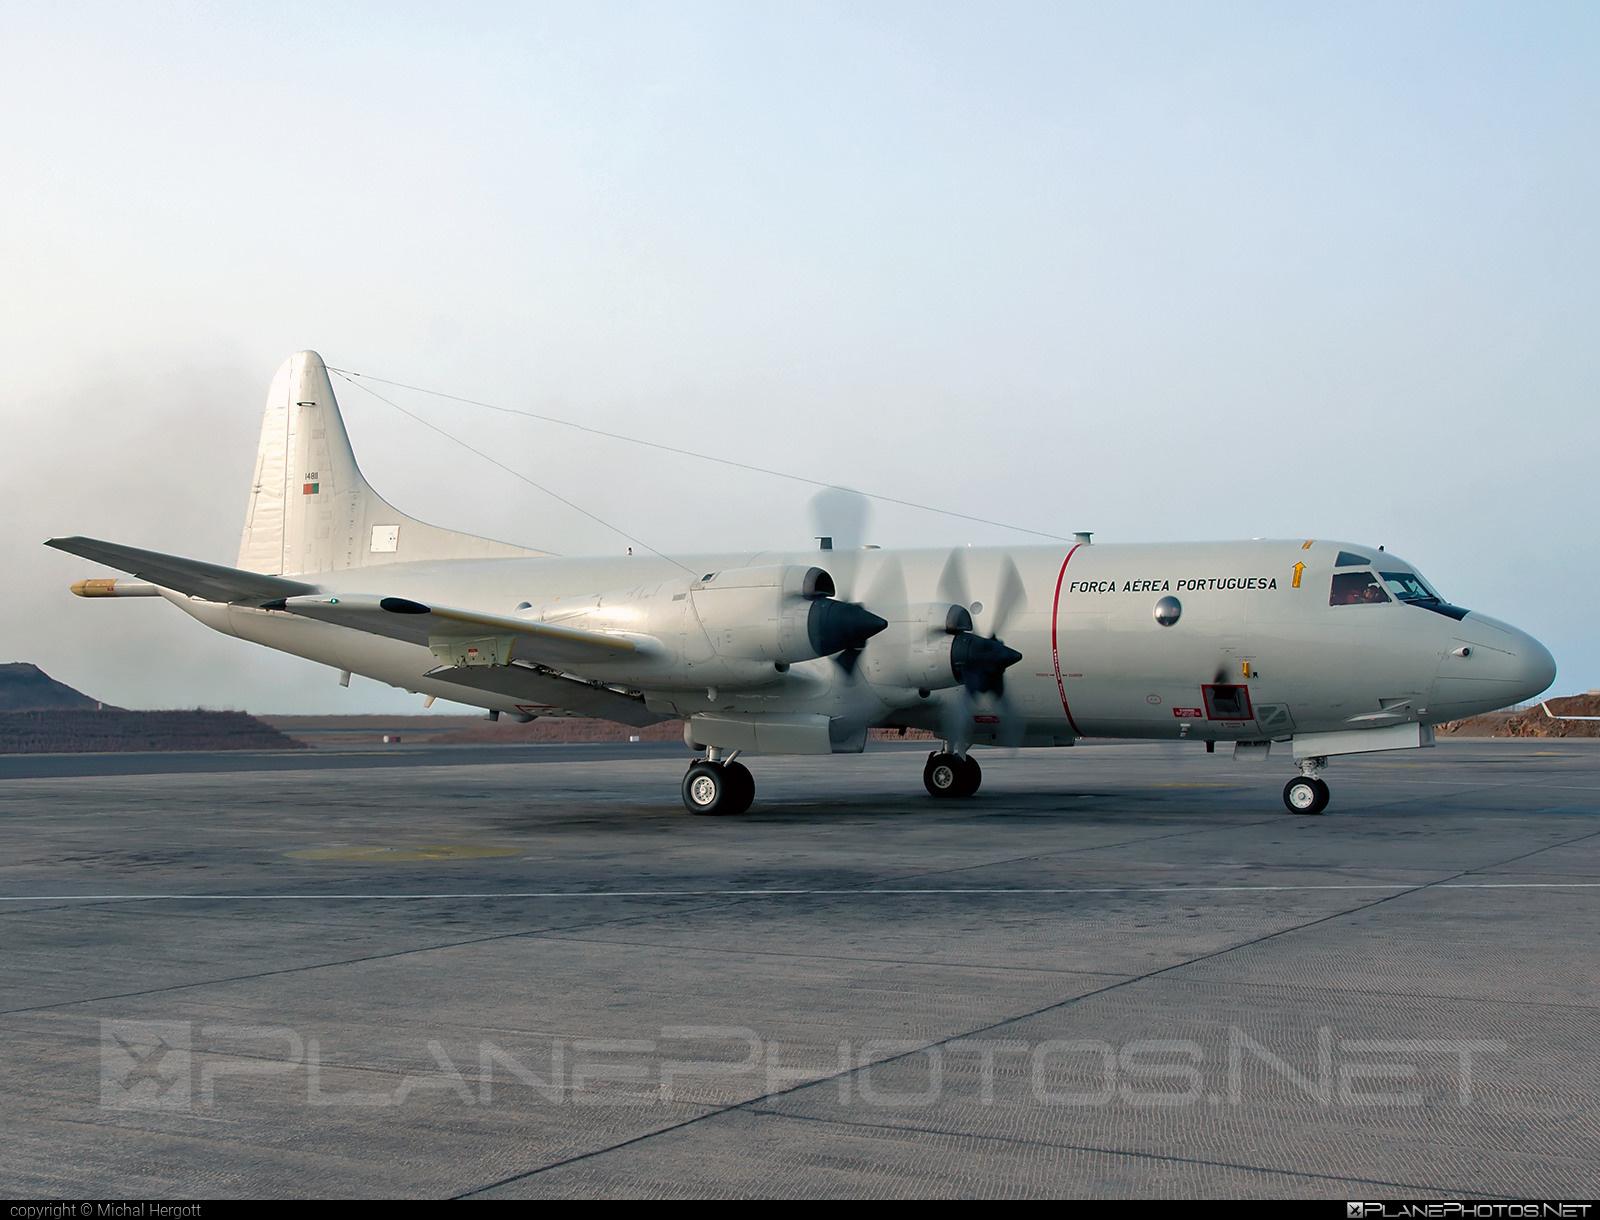 Lockheed P-3C Orion - 14811 operated by Força Aérea Portuguesa (Portuguese Air Force) #lockheed